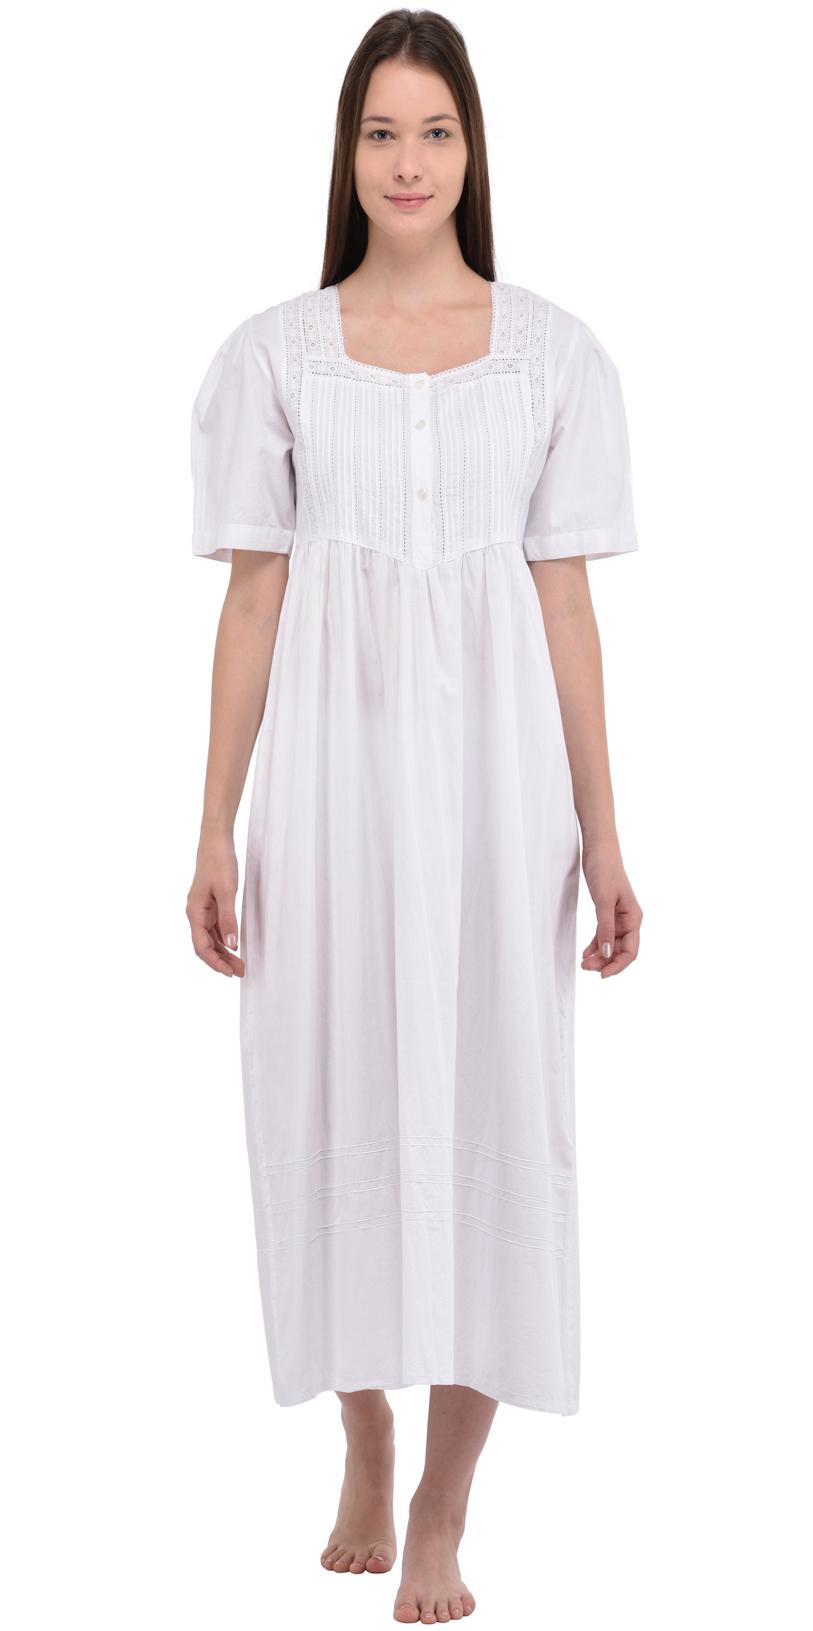 0ff3569670 Plus Size Nightie | Plus Size Long Cotton Nightdress | Cotton Lane ...